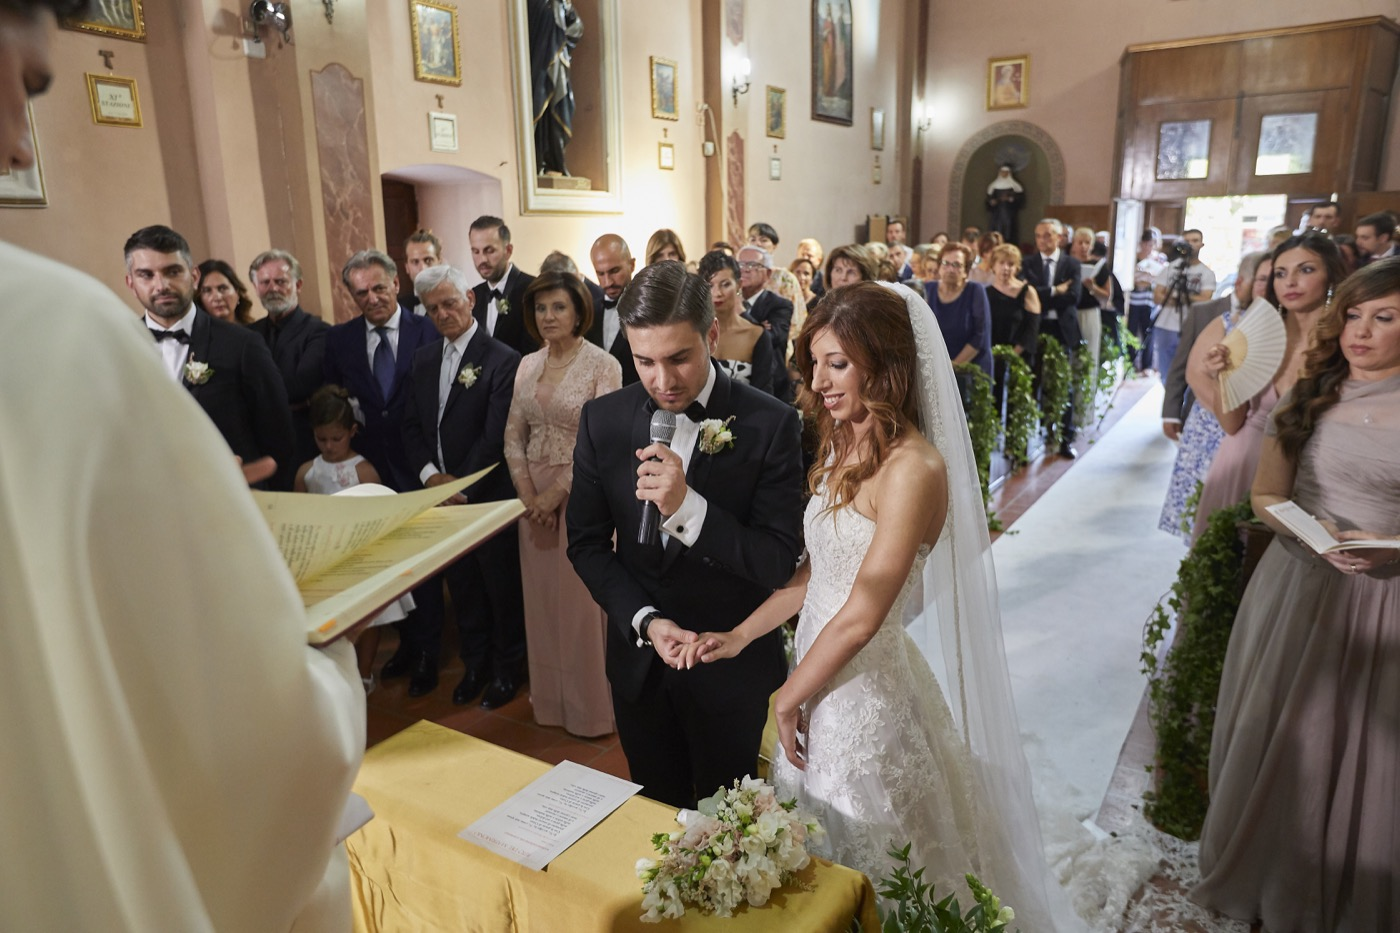 Claudio-Coppola-wedding-photographer-abbazia-7-frati-piegaro-47